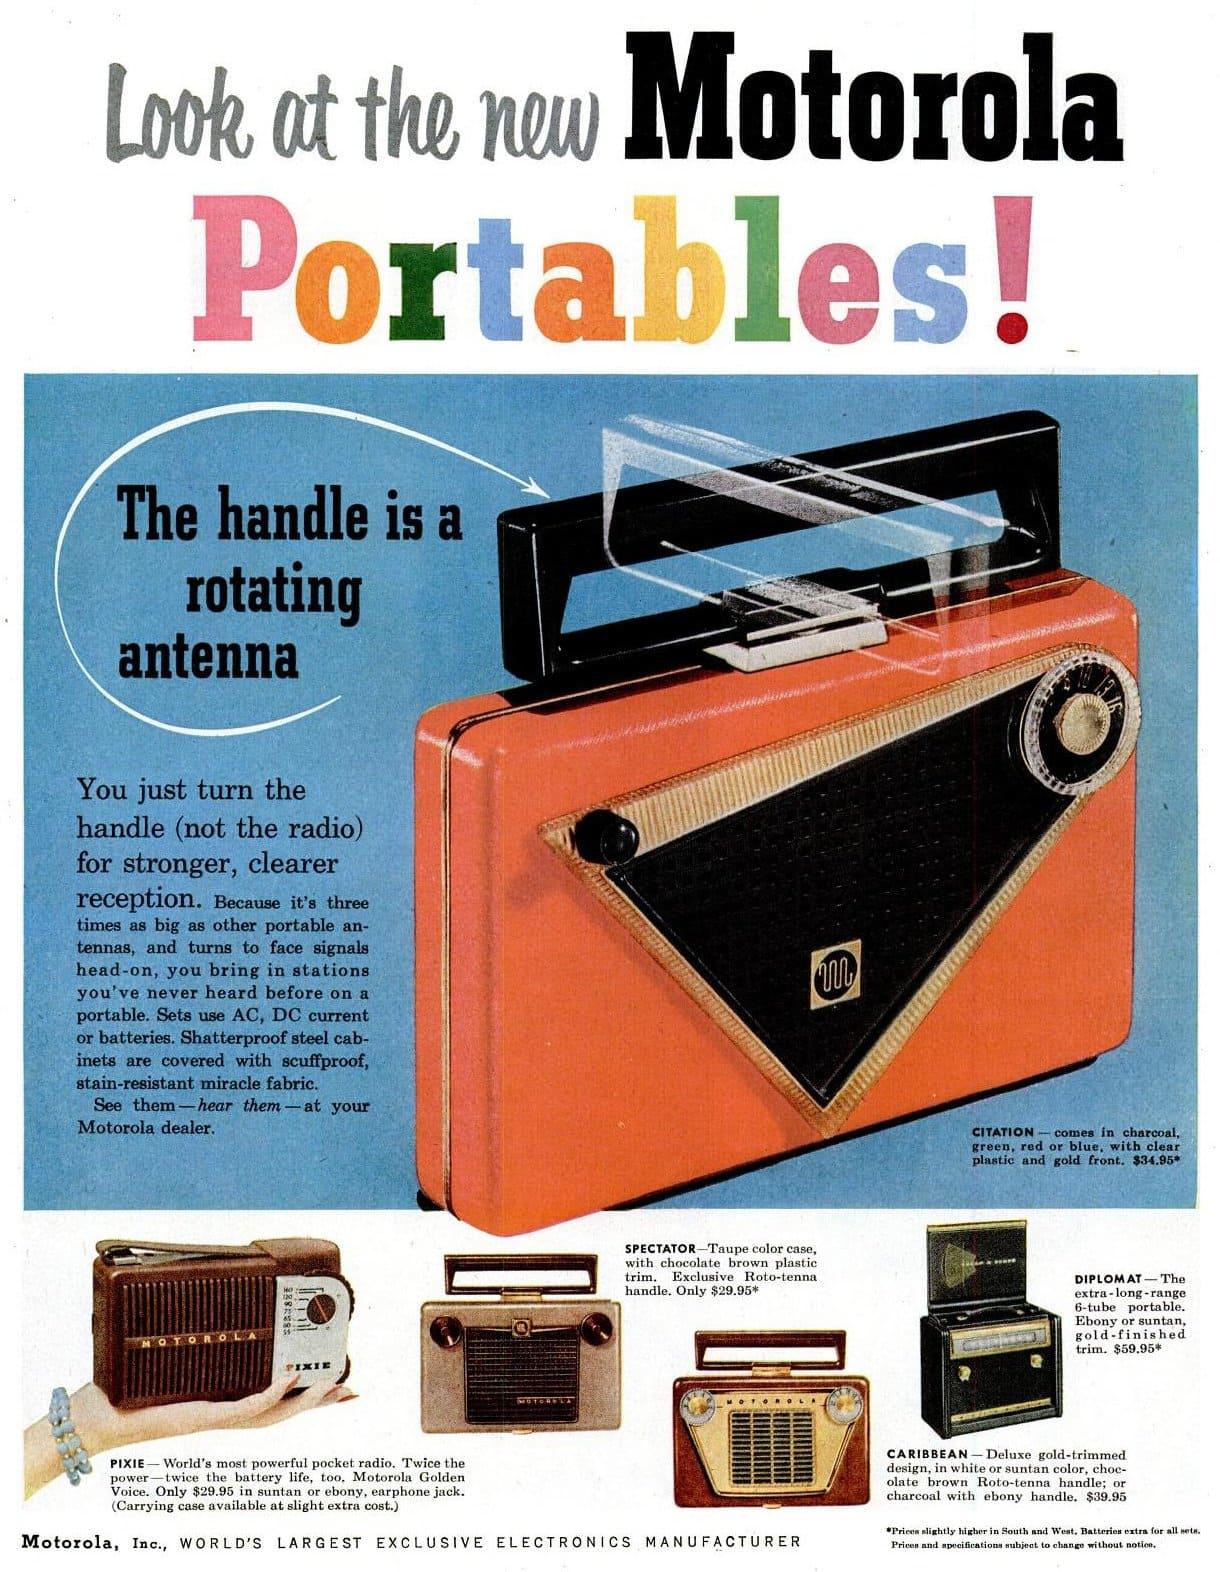 New Motorola Portables - AM radios (1955)